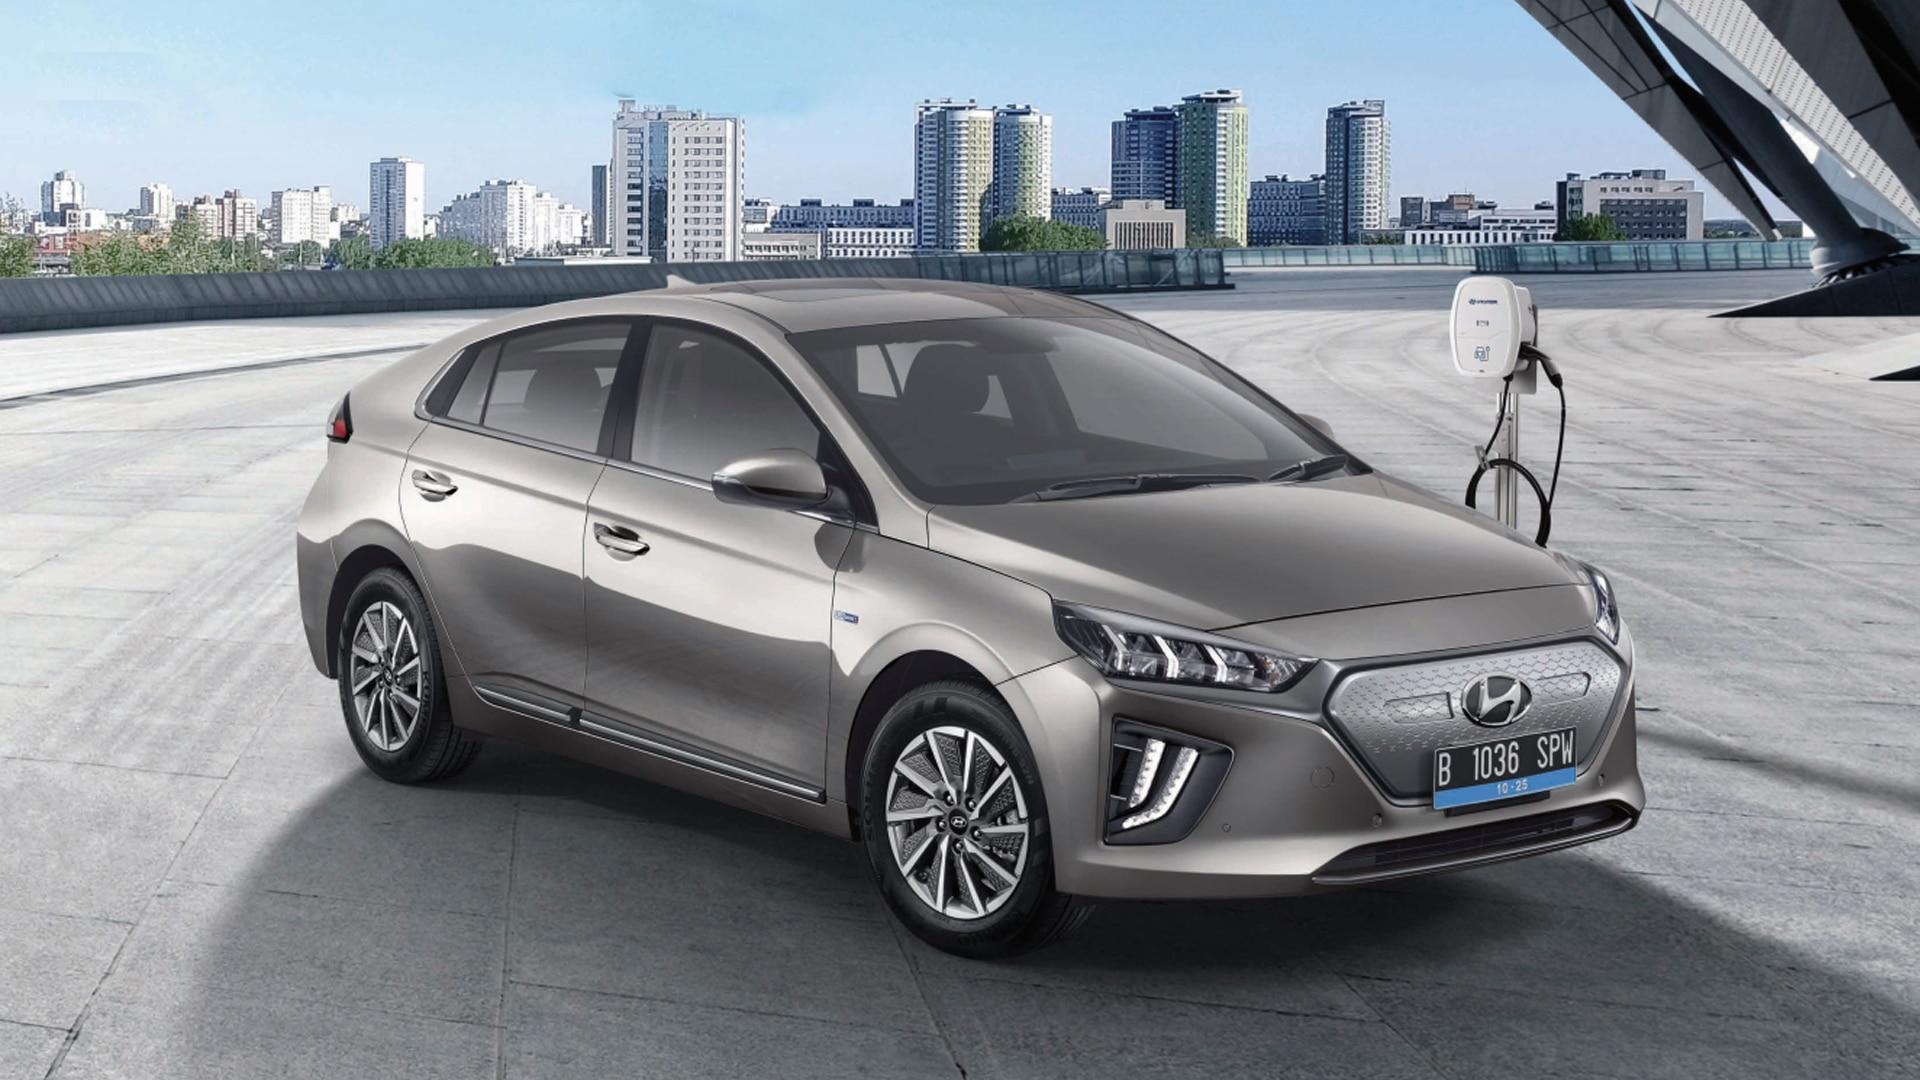 Beragam Keuntungan Dan Kelebihan Memiliki Hyundai IONIQ Electric